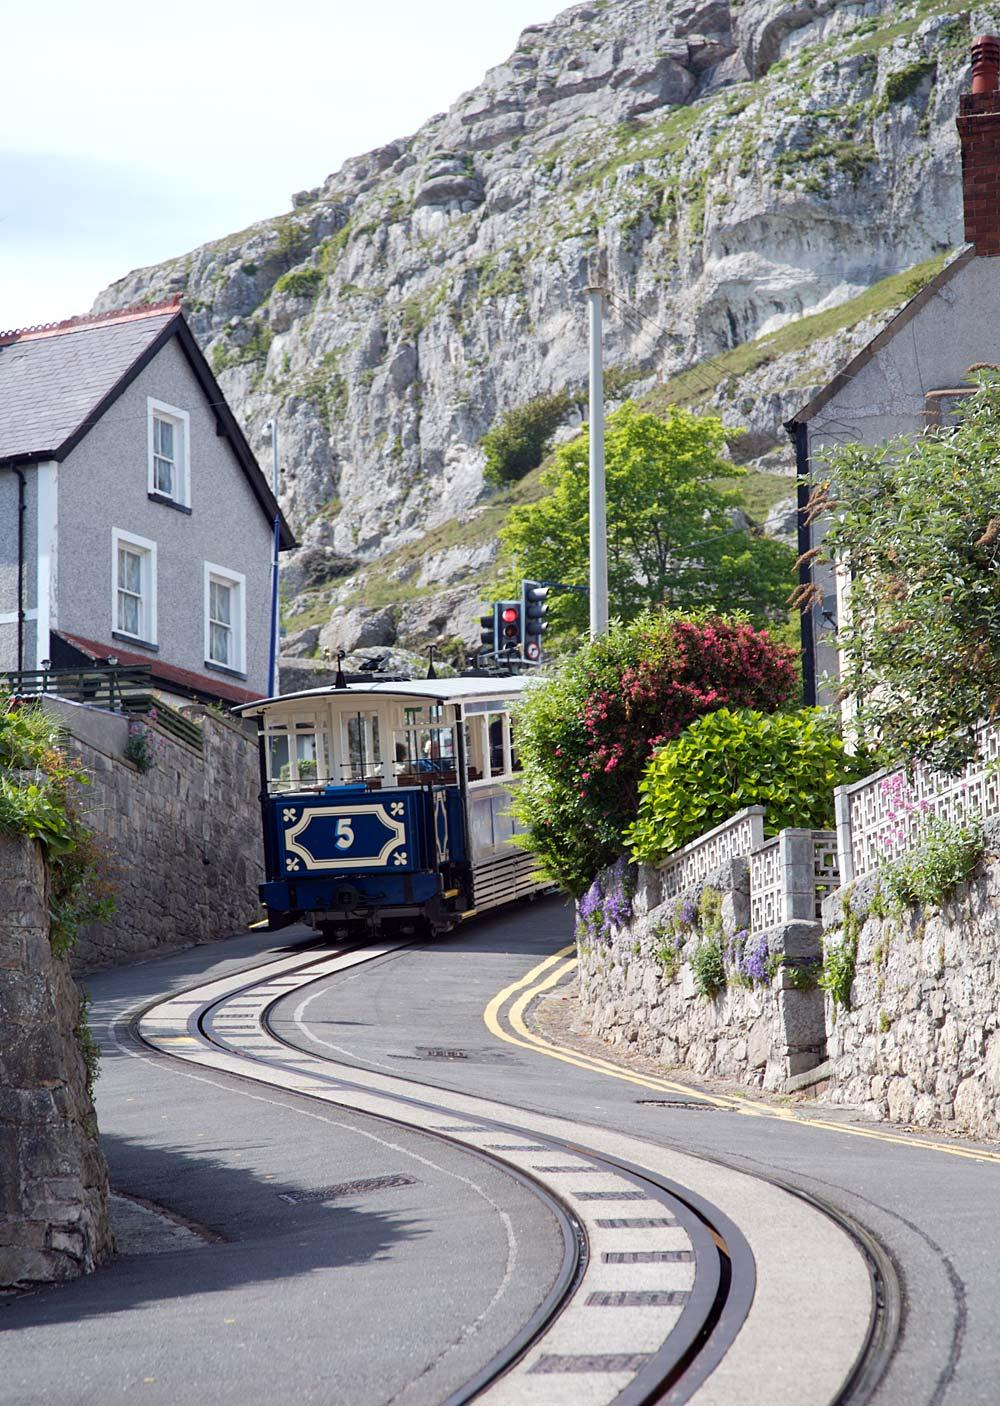 Llandudno tram